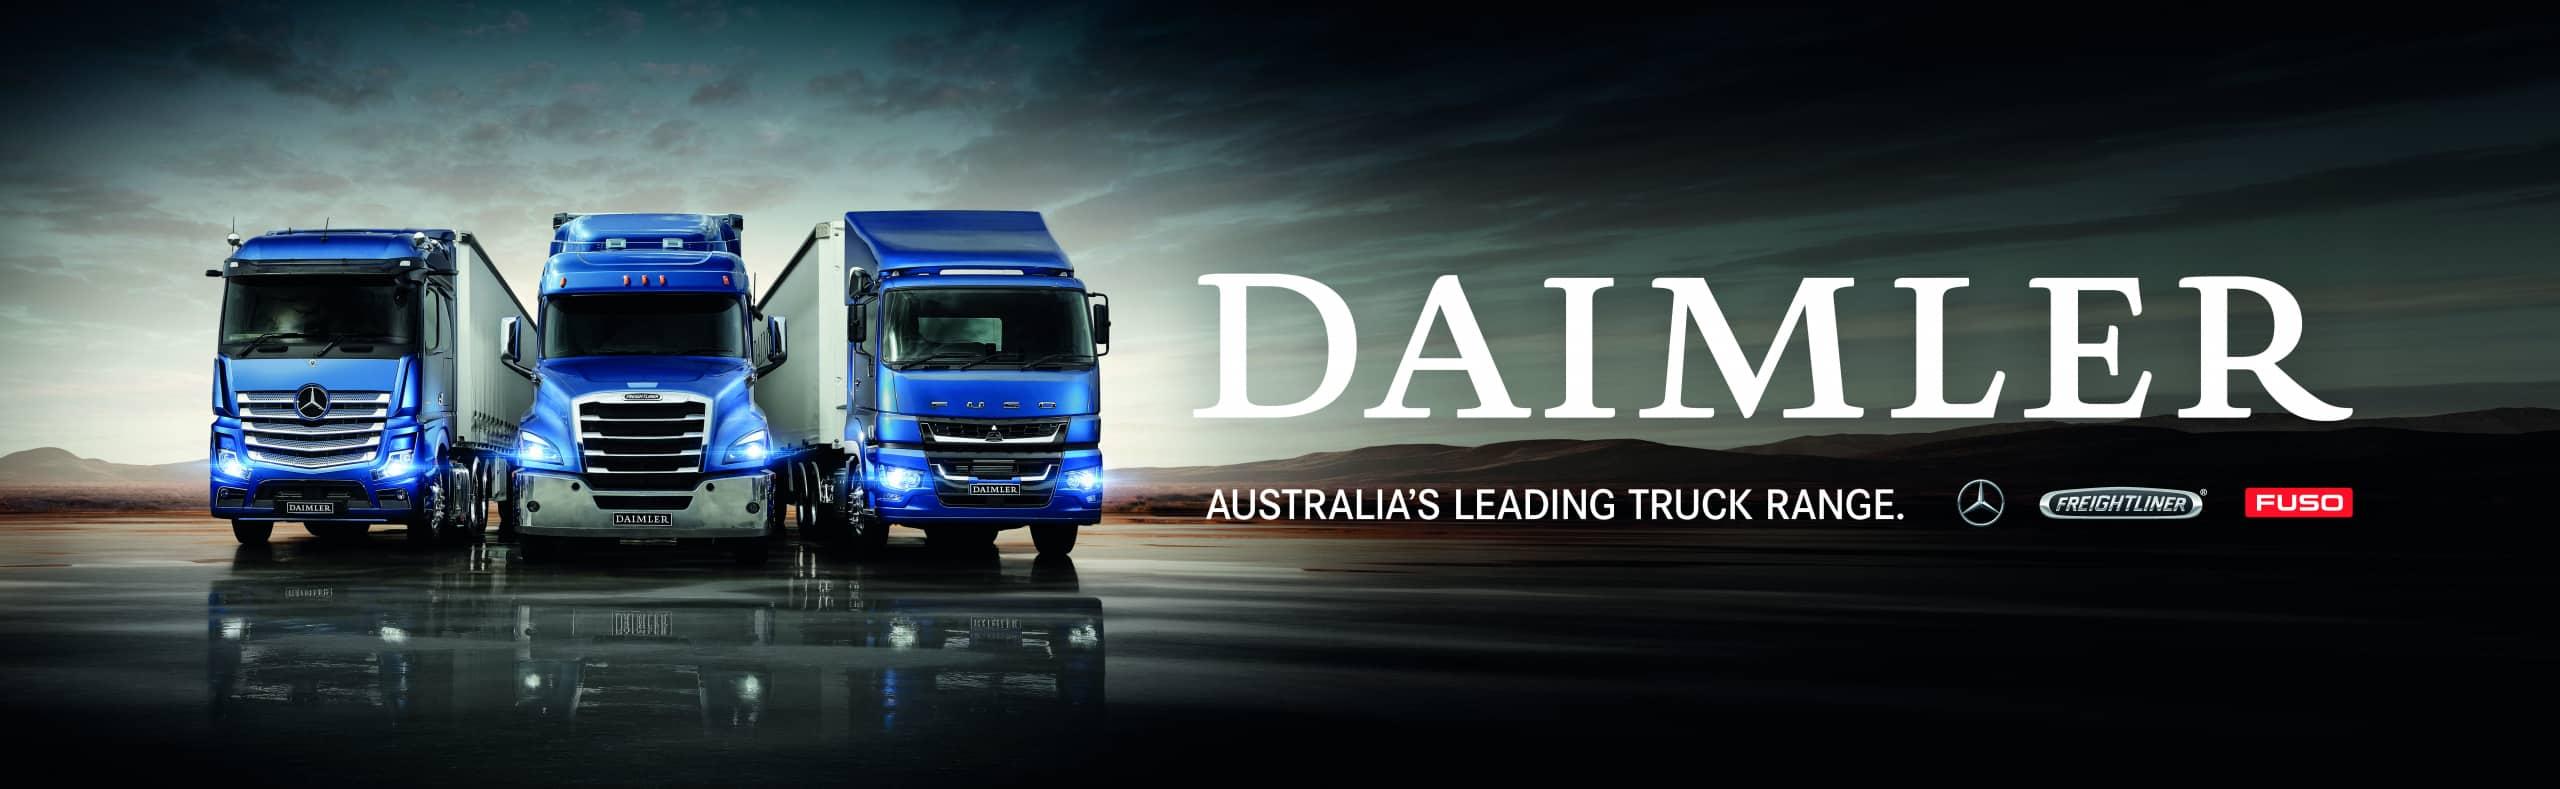 Akkomplice | Daimler — Brisbane Truckshow 2021